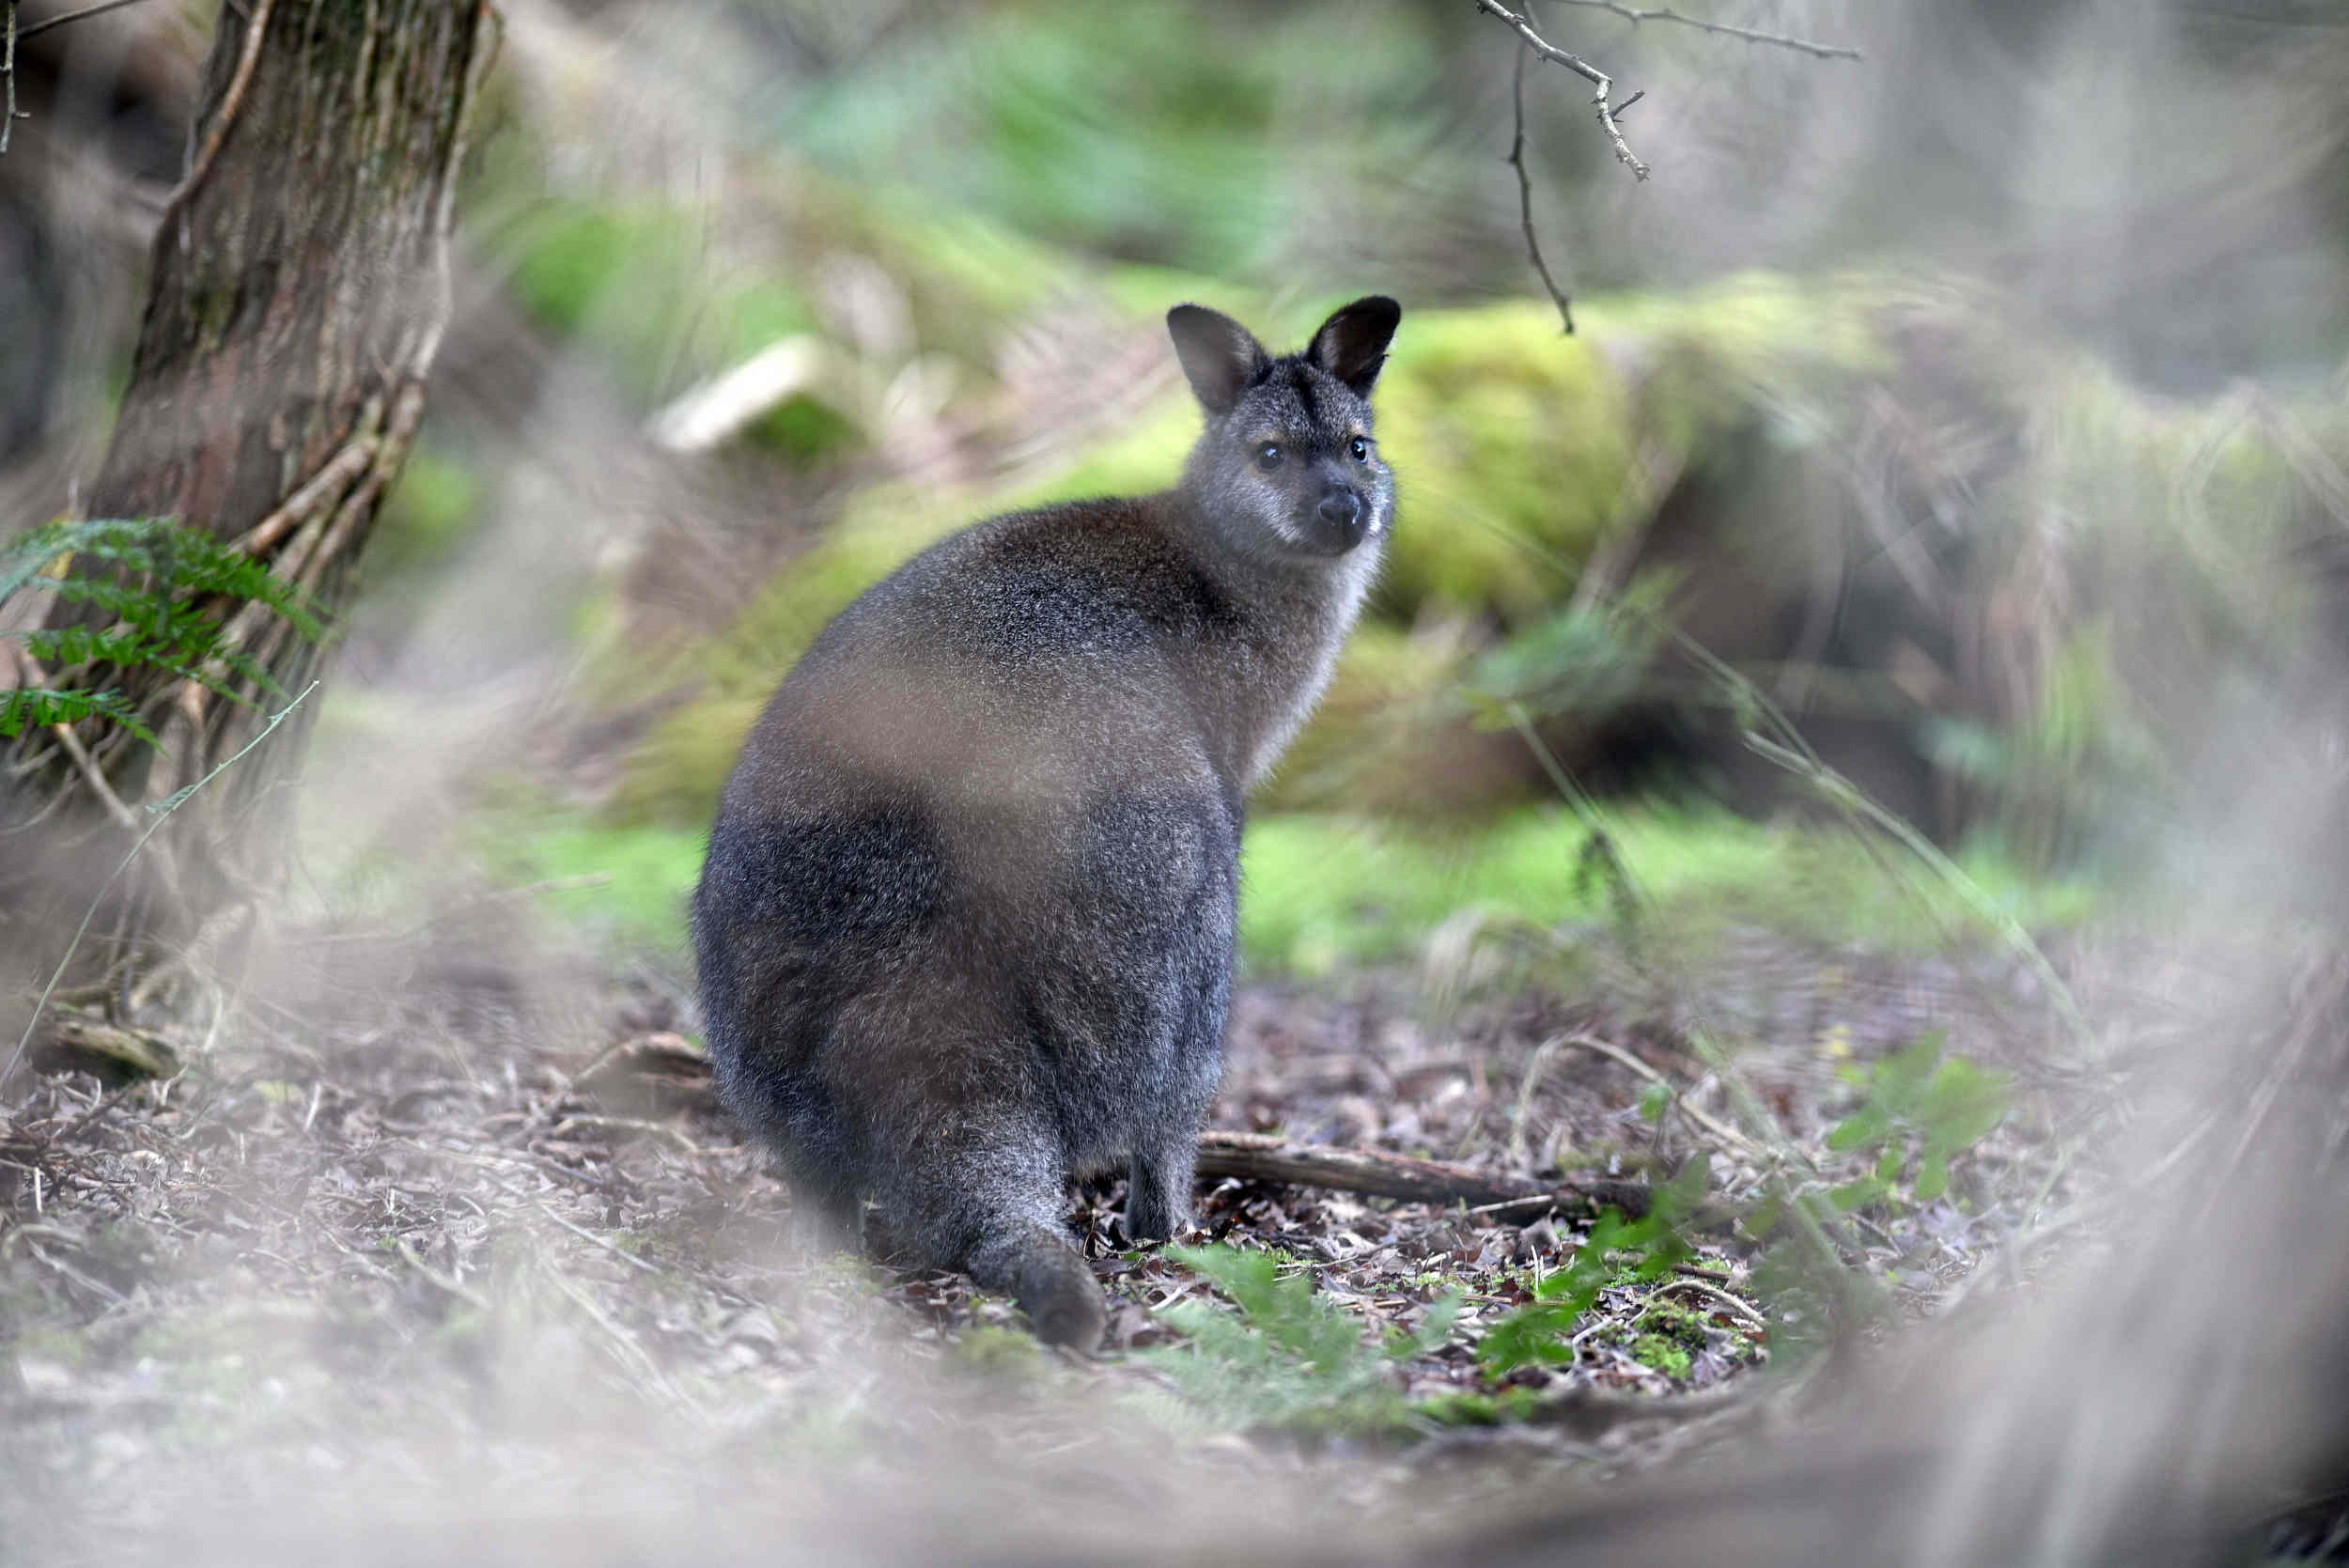 A wallaby at Close Sartfield on January 23, 2016